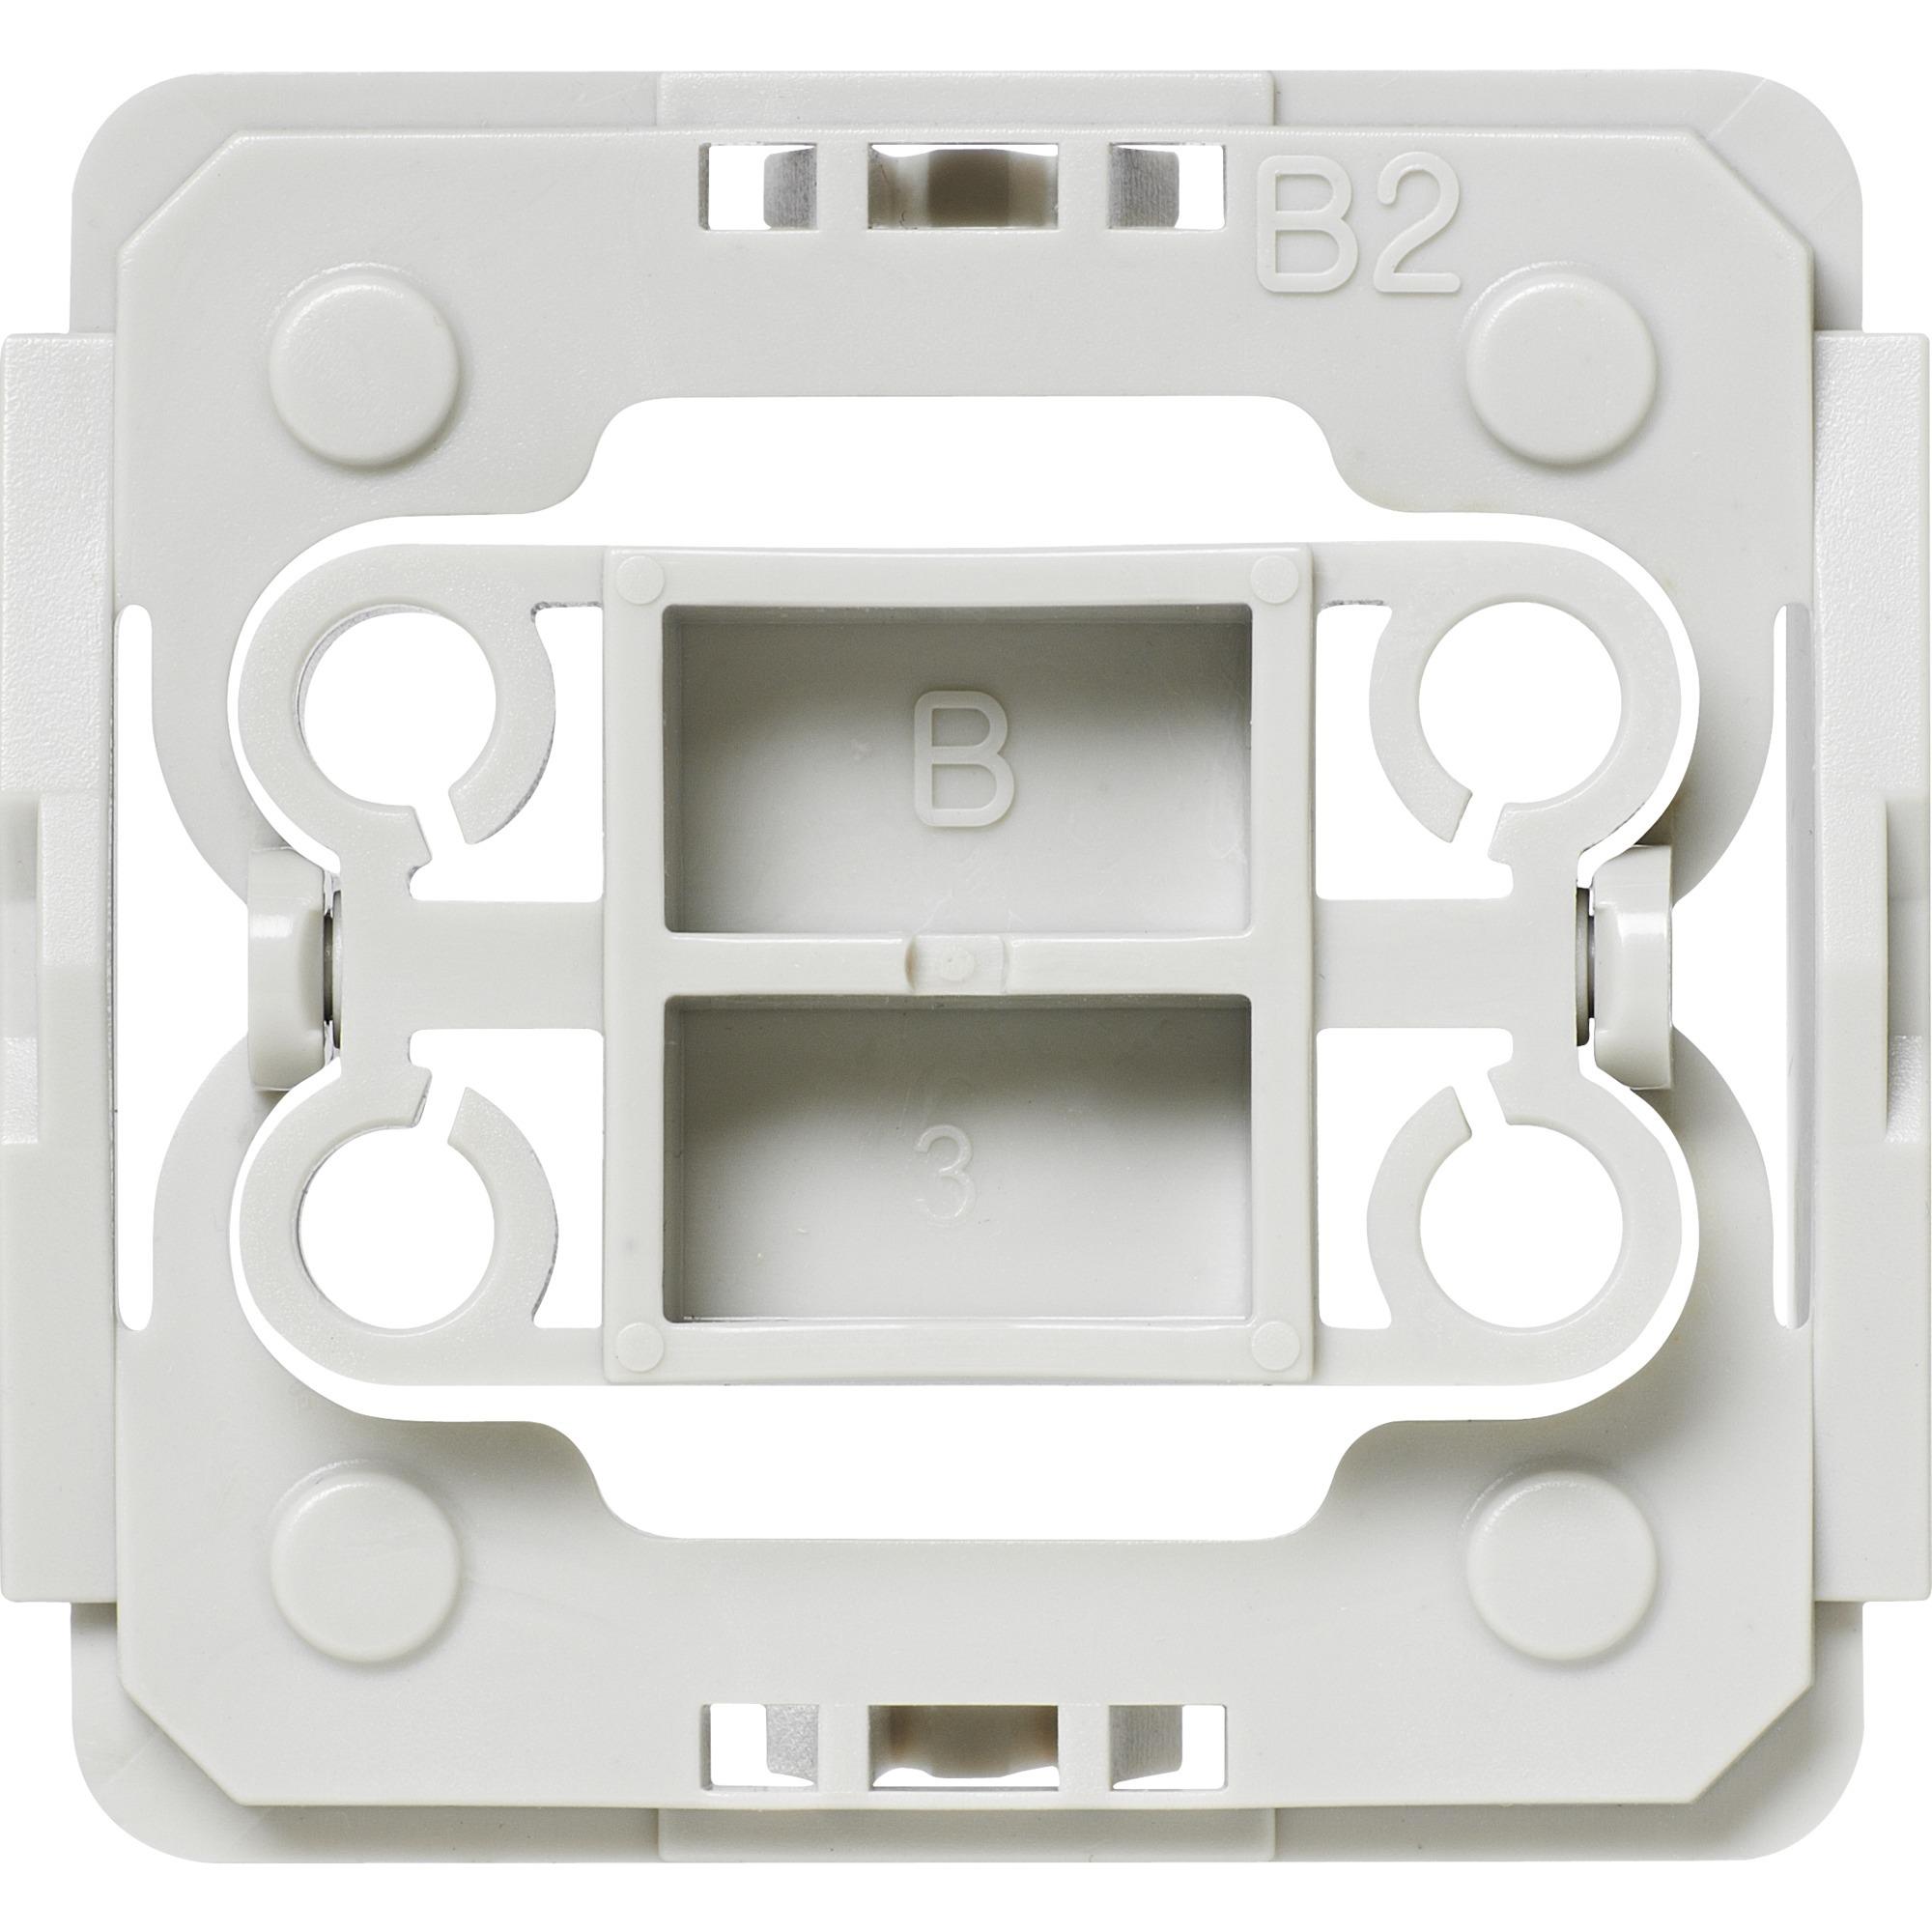 EQ3-ADA-B2 Atenuador e interruptor Integrado Gris, Blanco, Adaptador